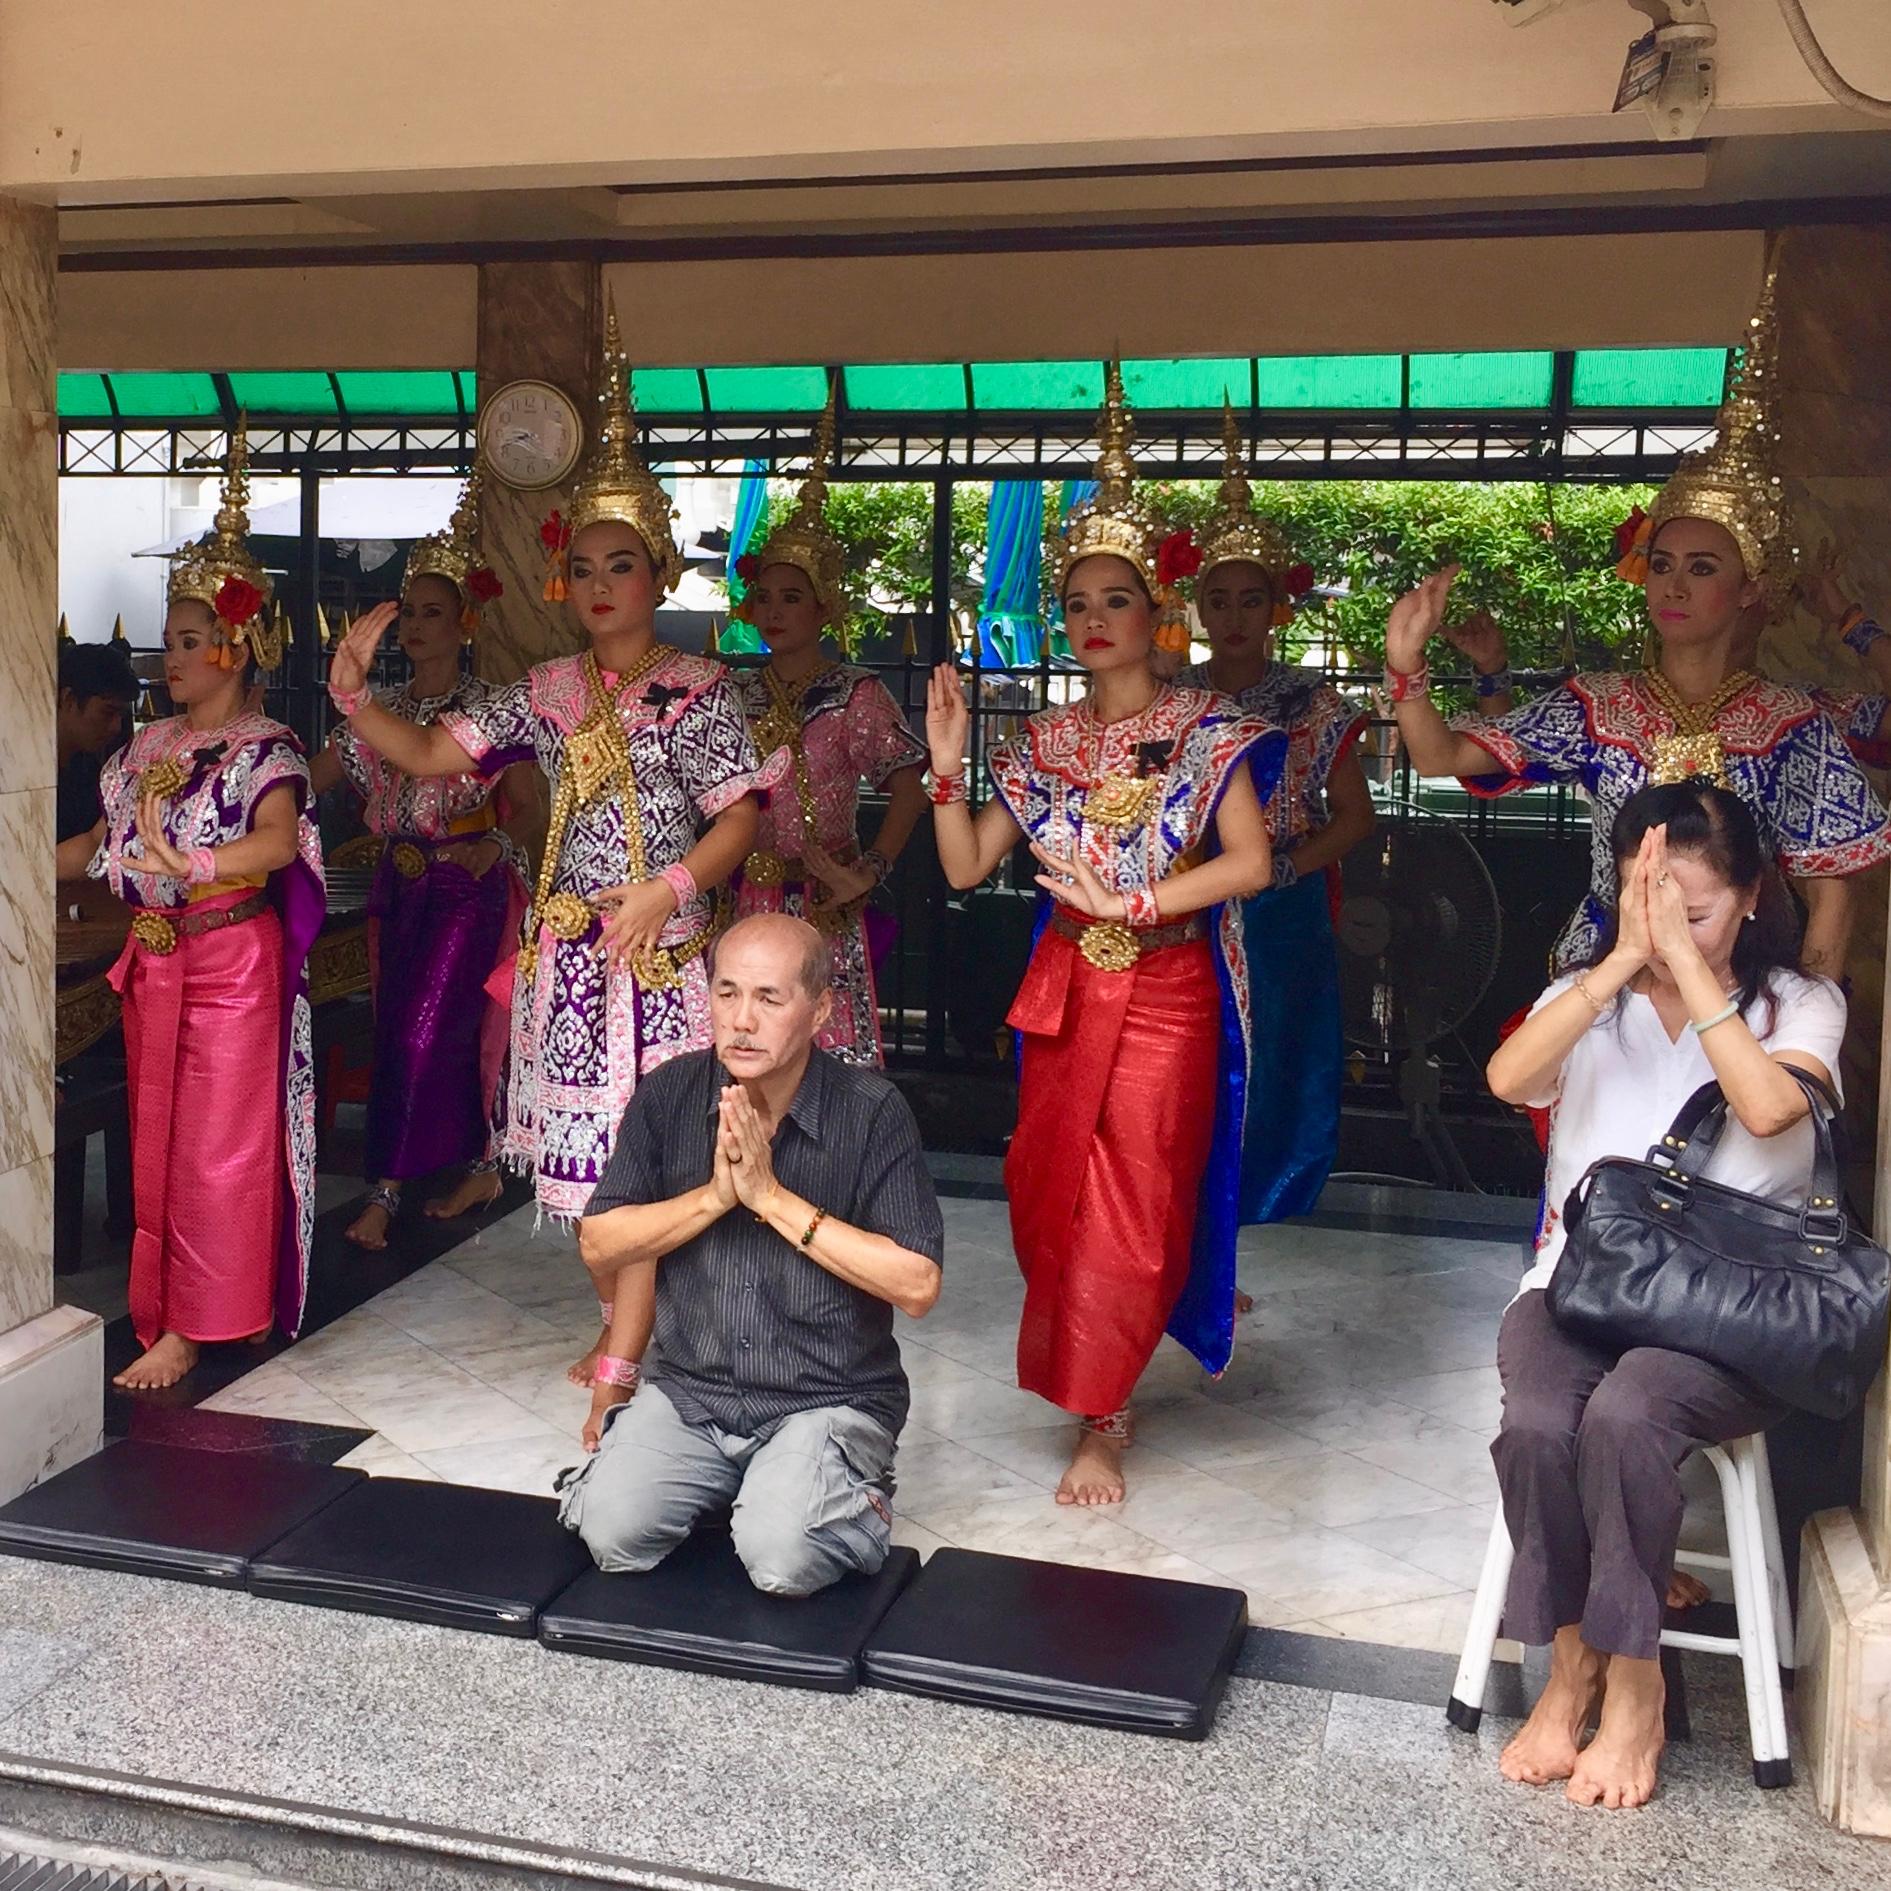 Thai traditional dancers